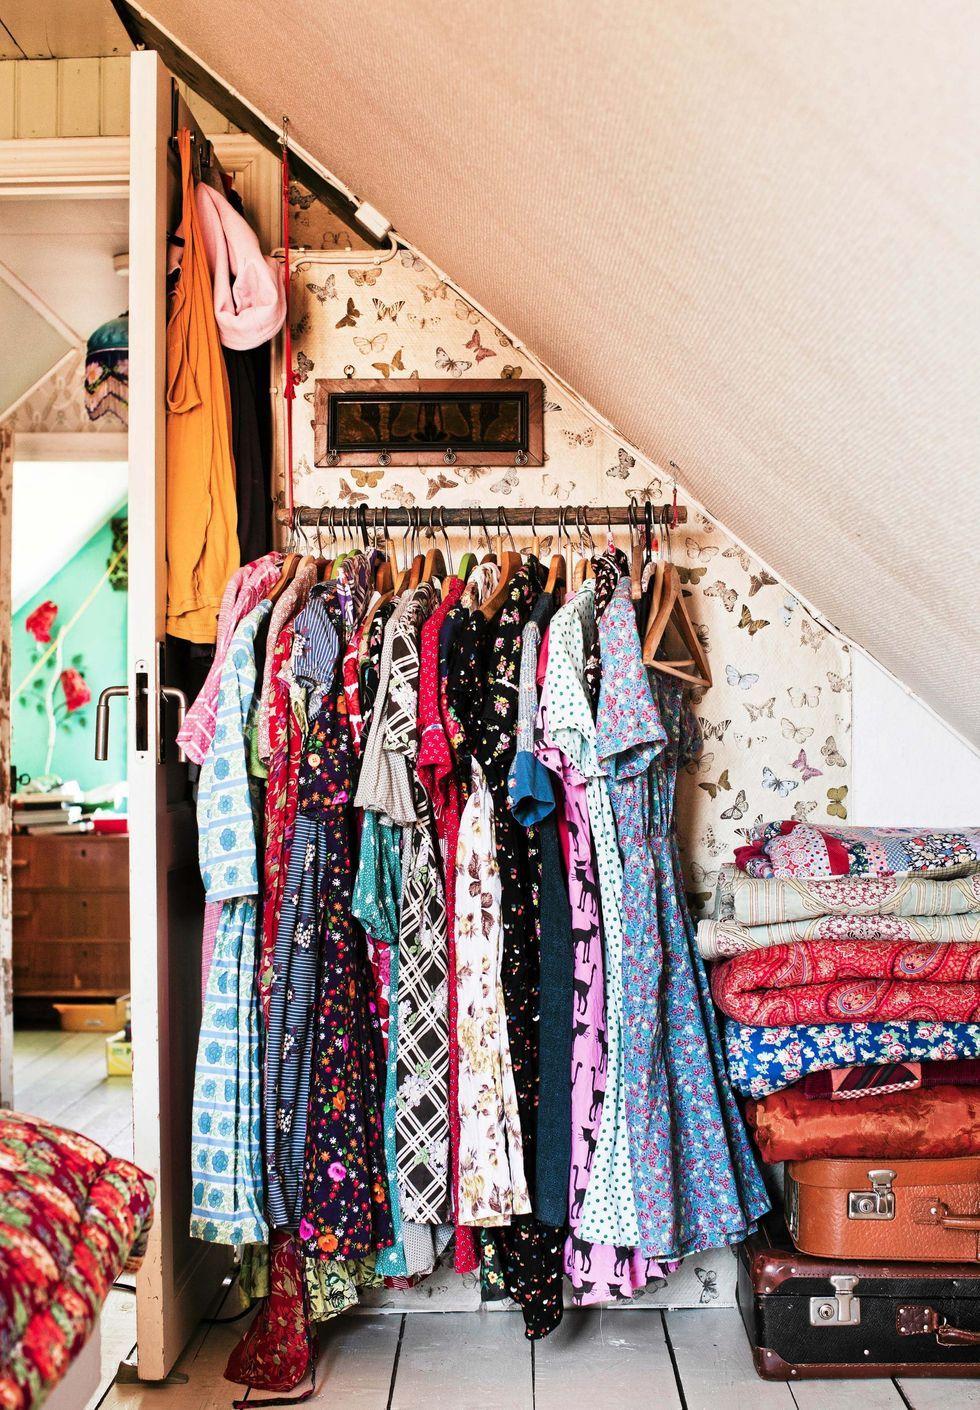 Vintage Swedish Christmas home Follow Gravity Home: Blog - Instagram ...